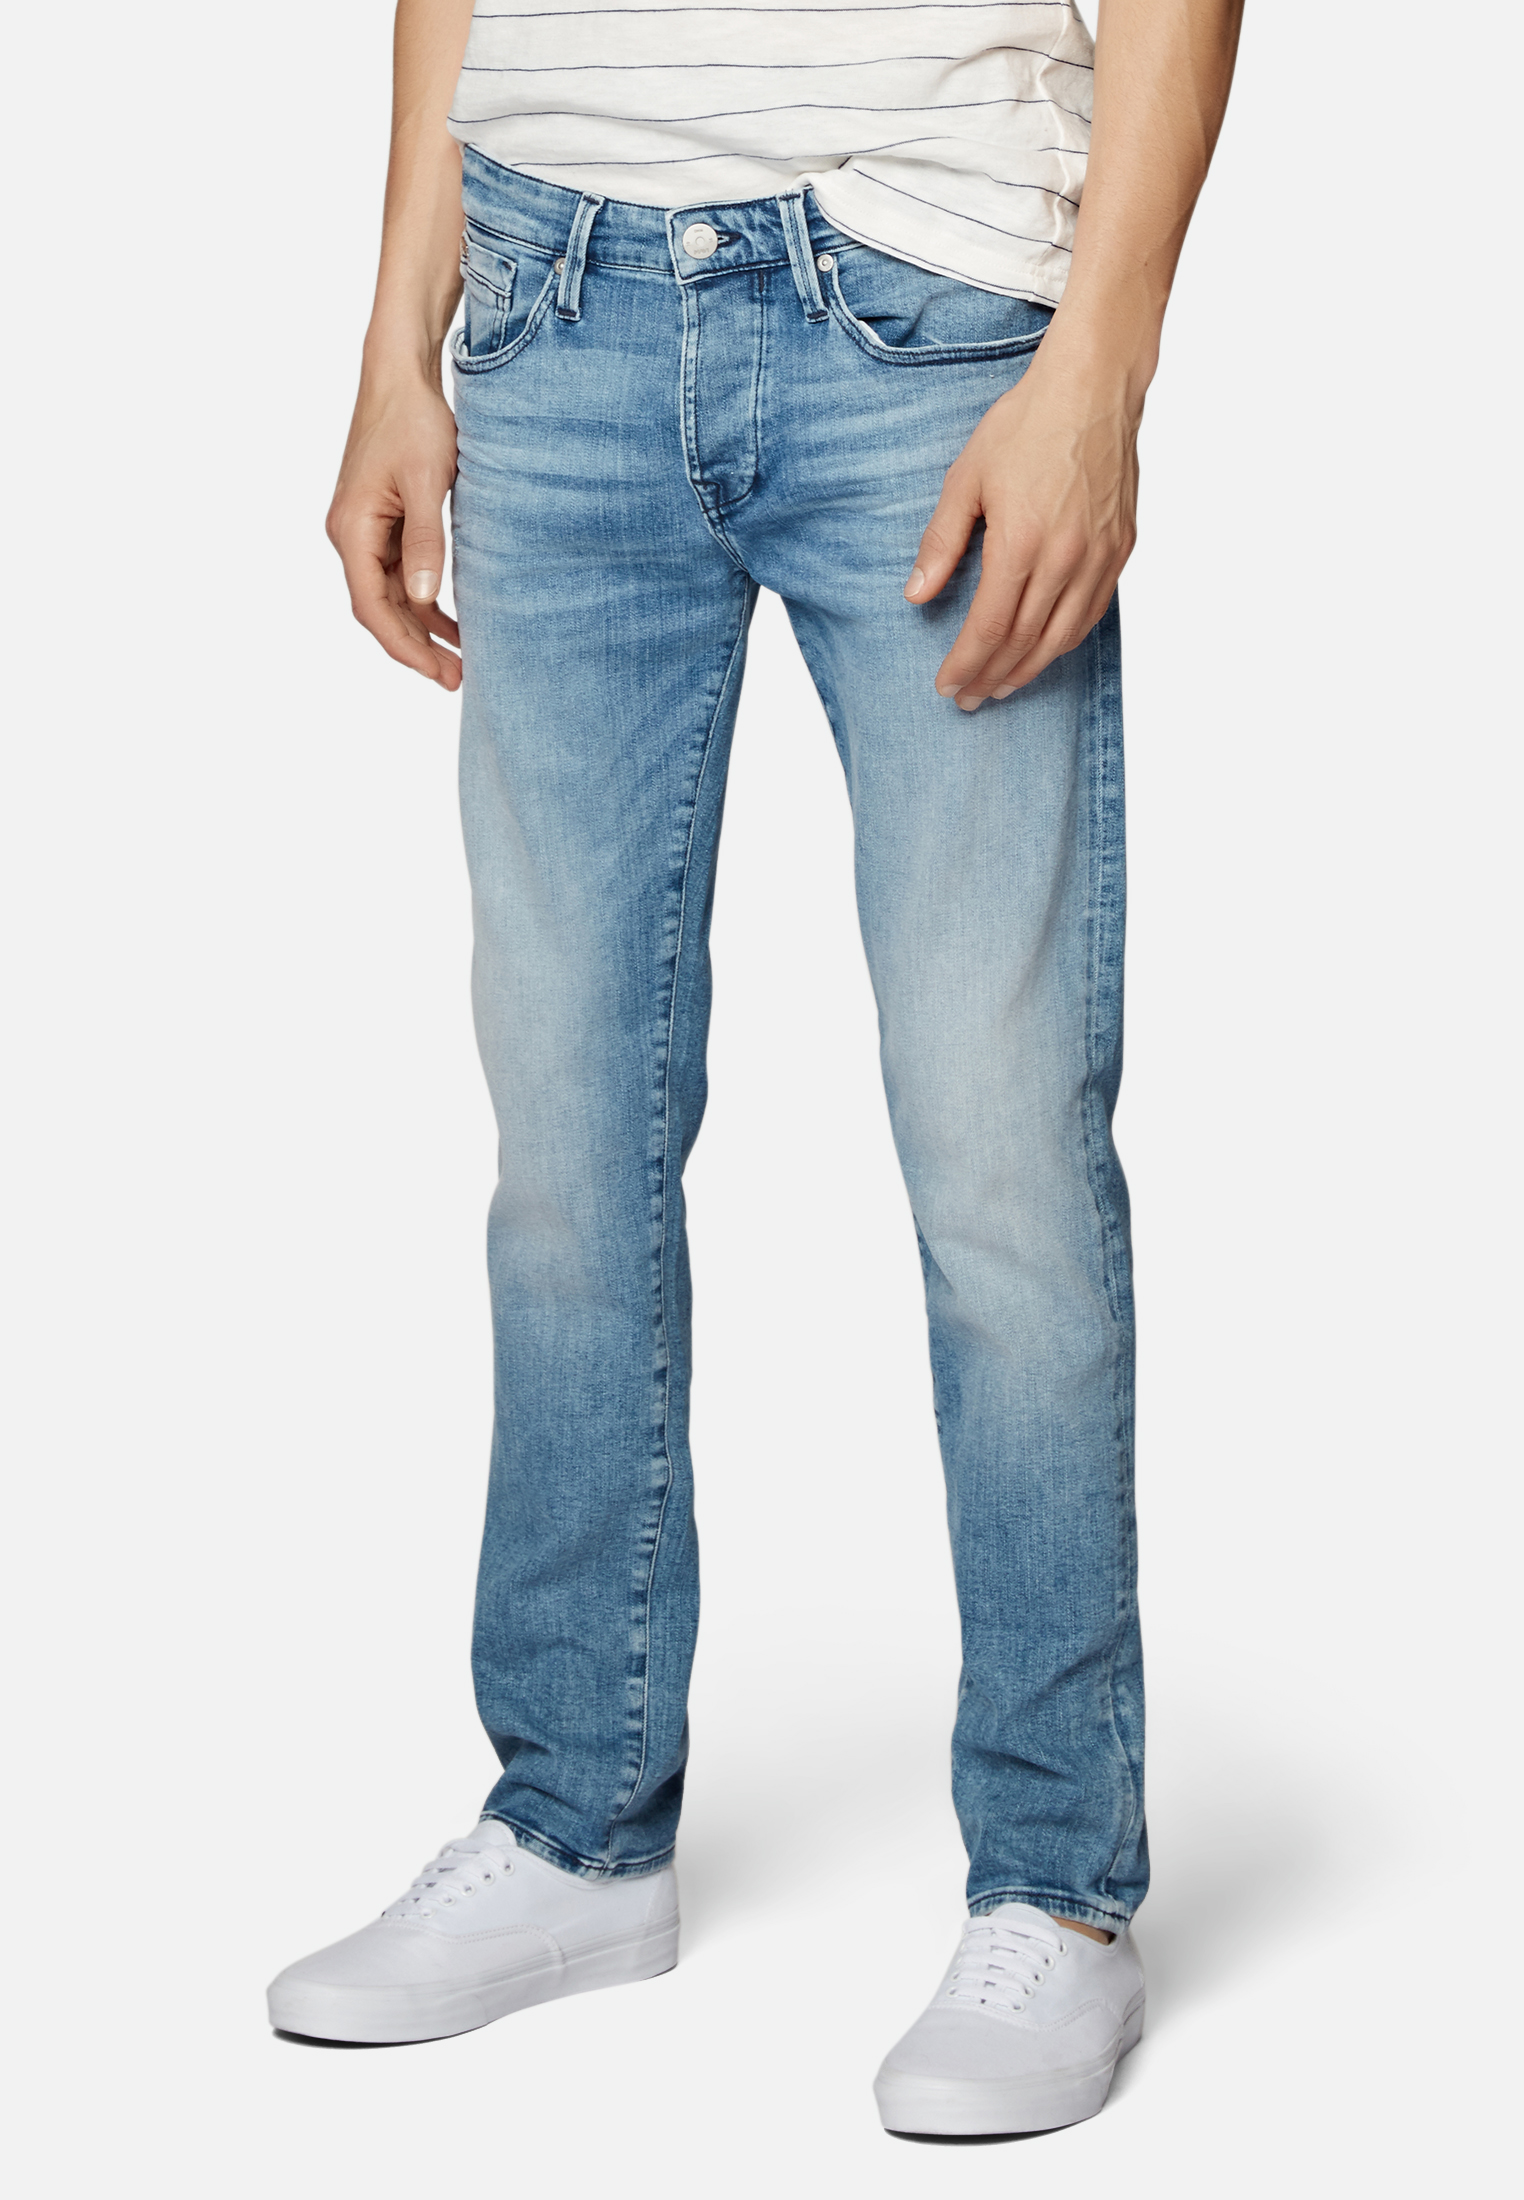 Mavi Jeans YVES mid brushed ultra move